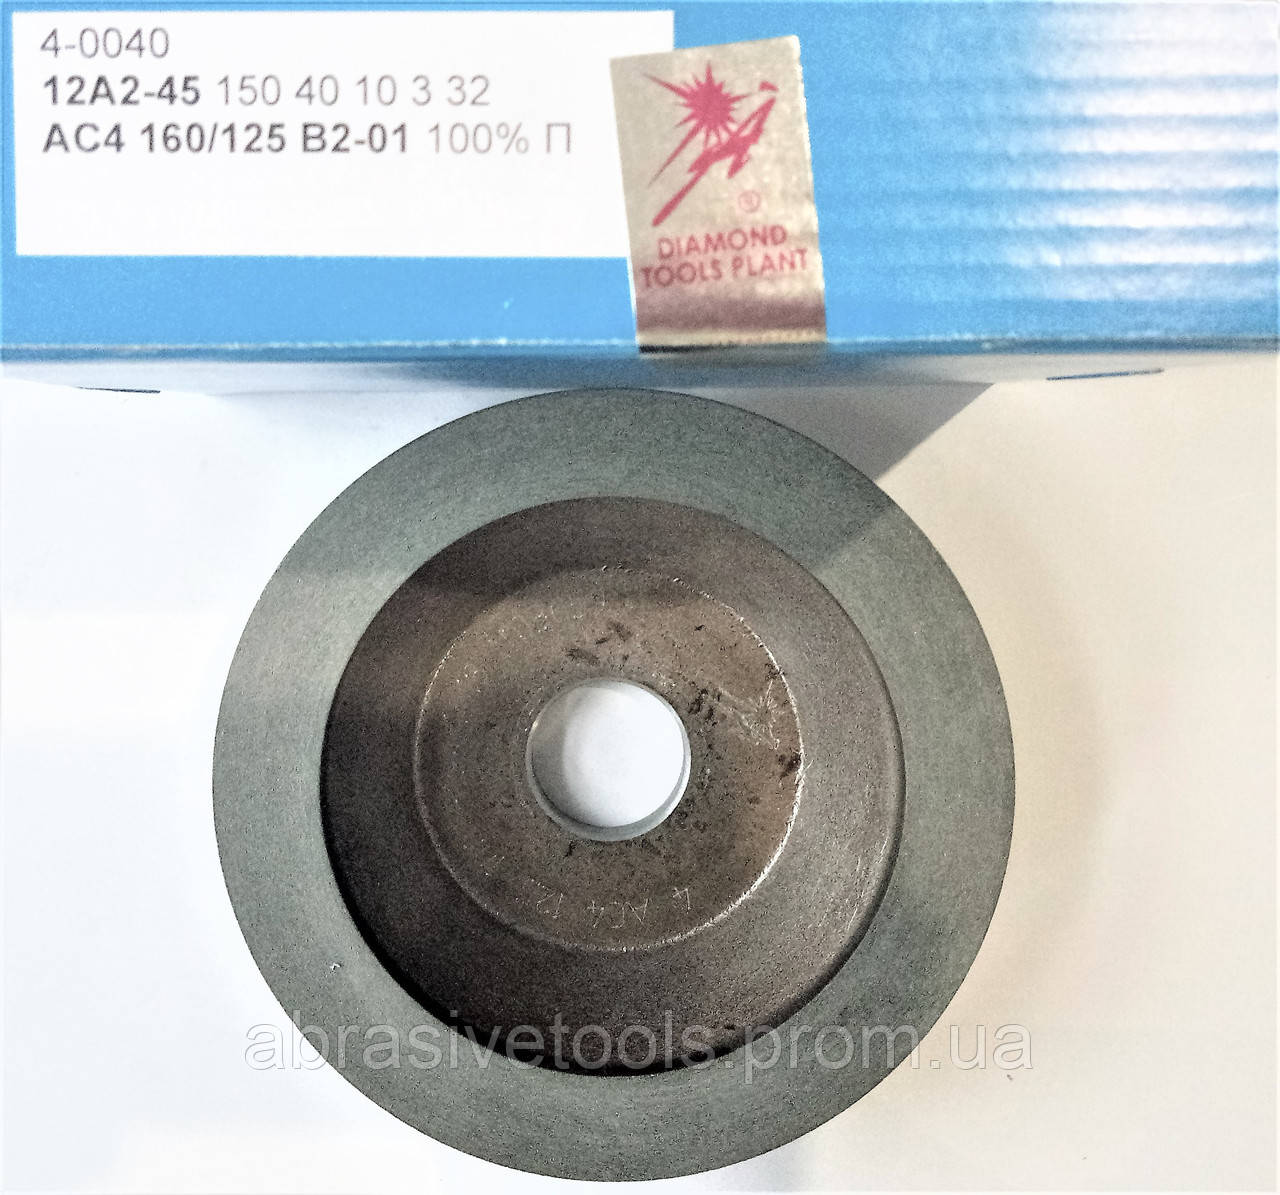 Алмазная чашка 12 А2-45° 150х10х3х40х32 АС4 160/125 В2-01 100% 58,00 карат